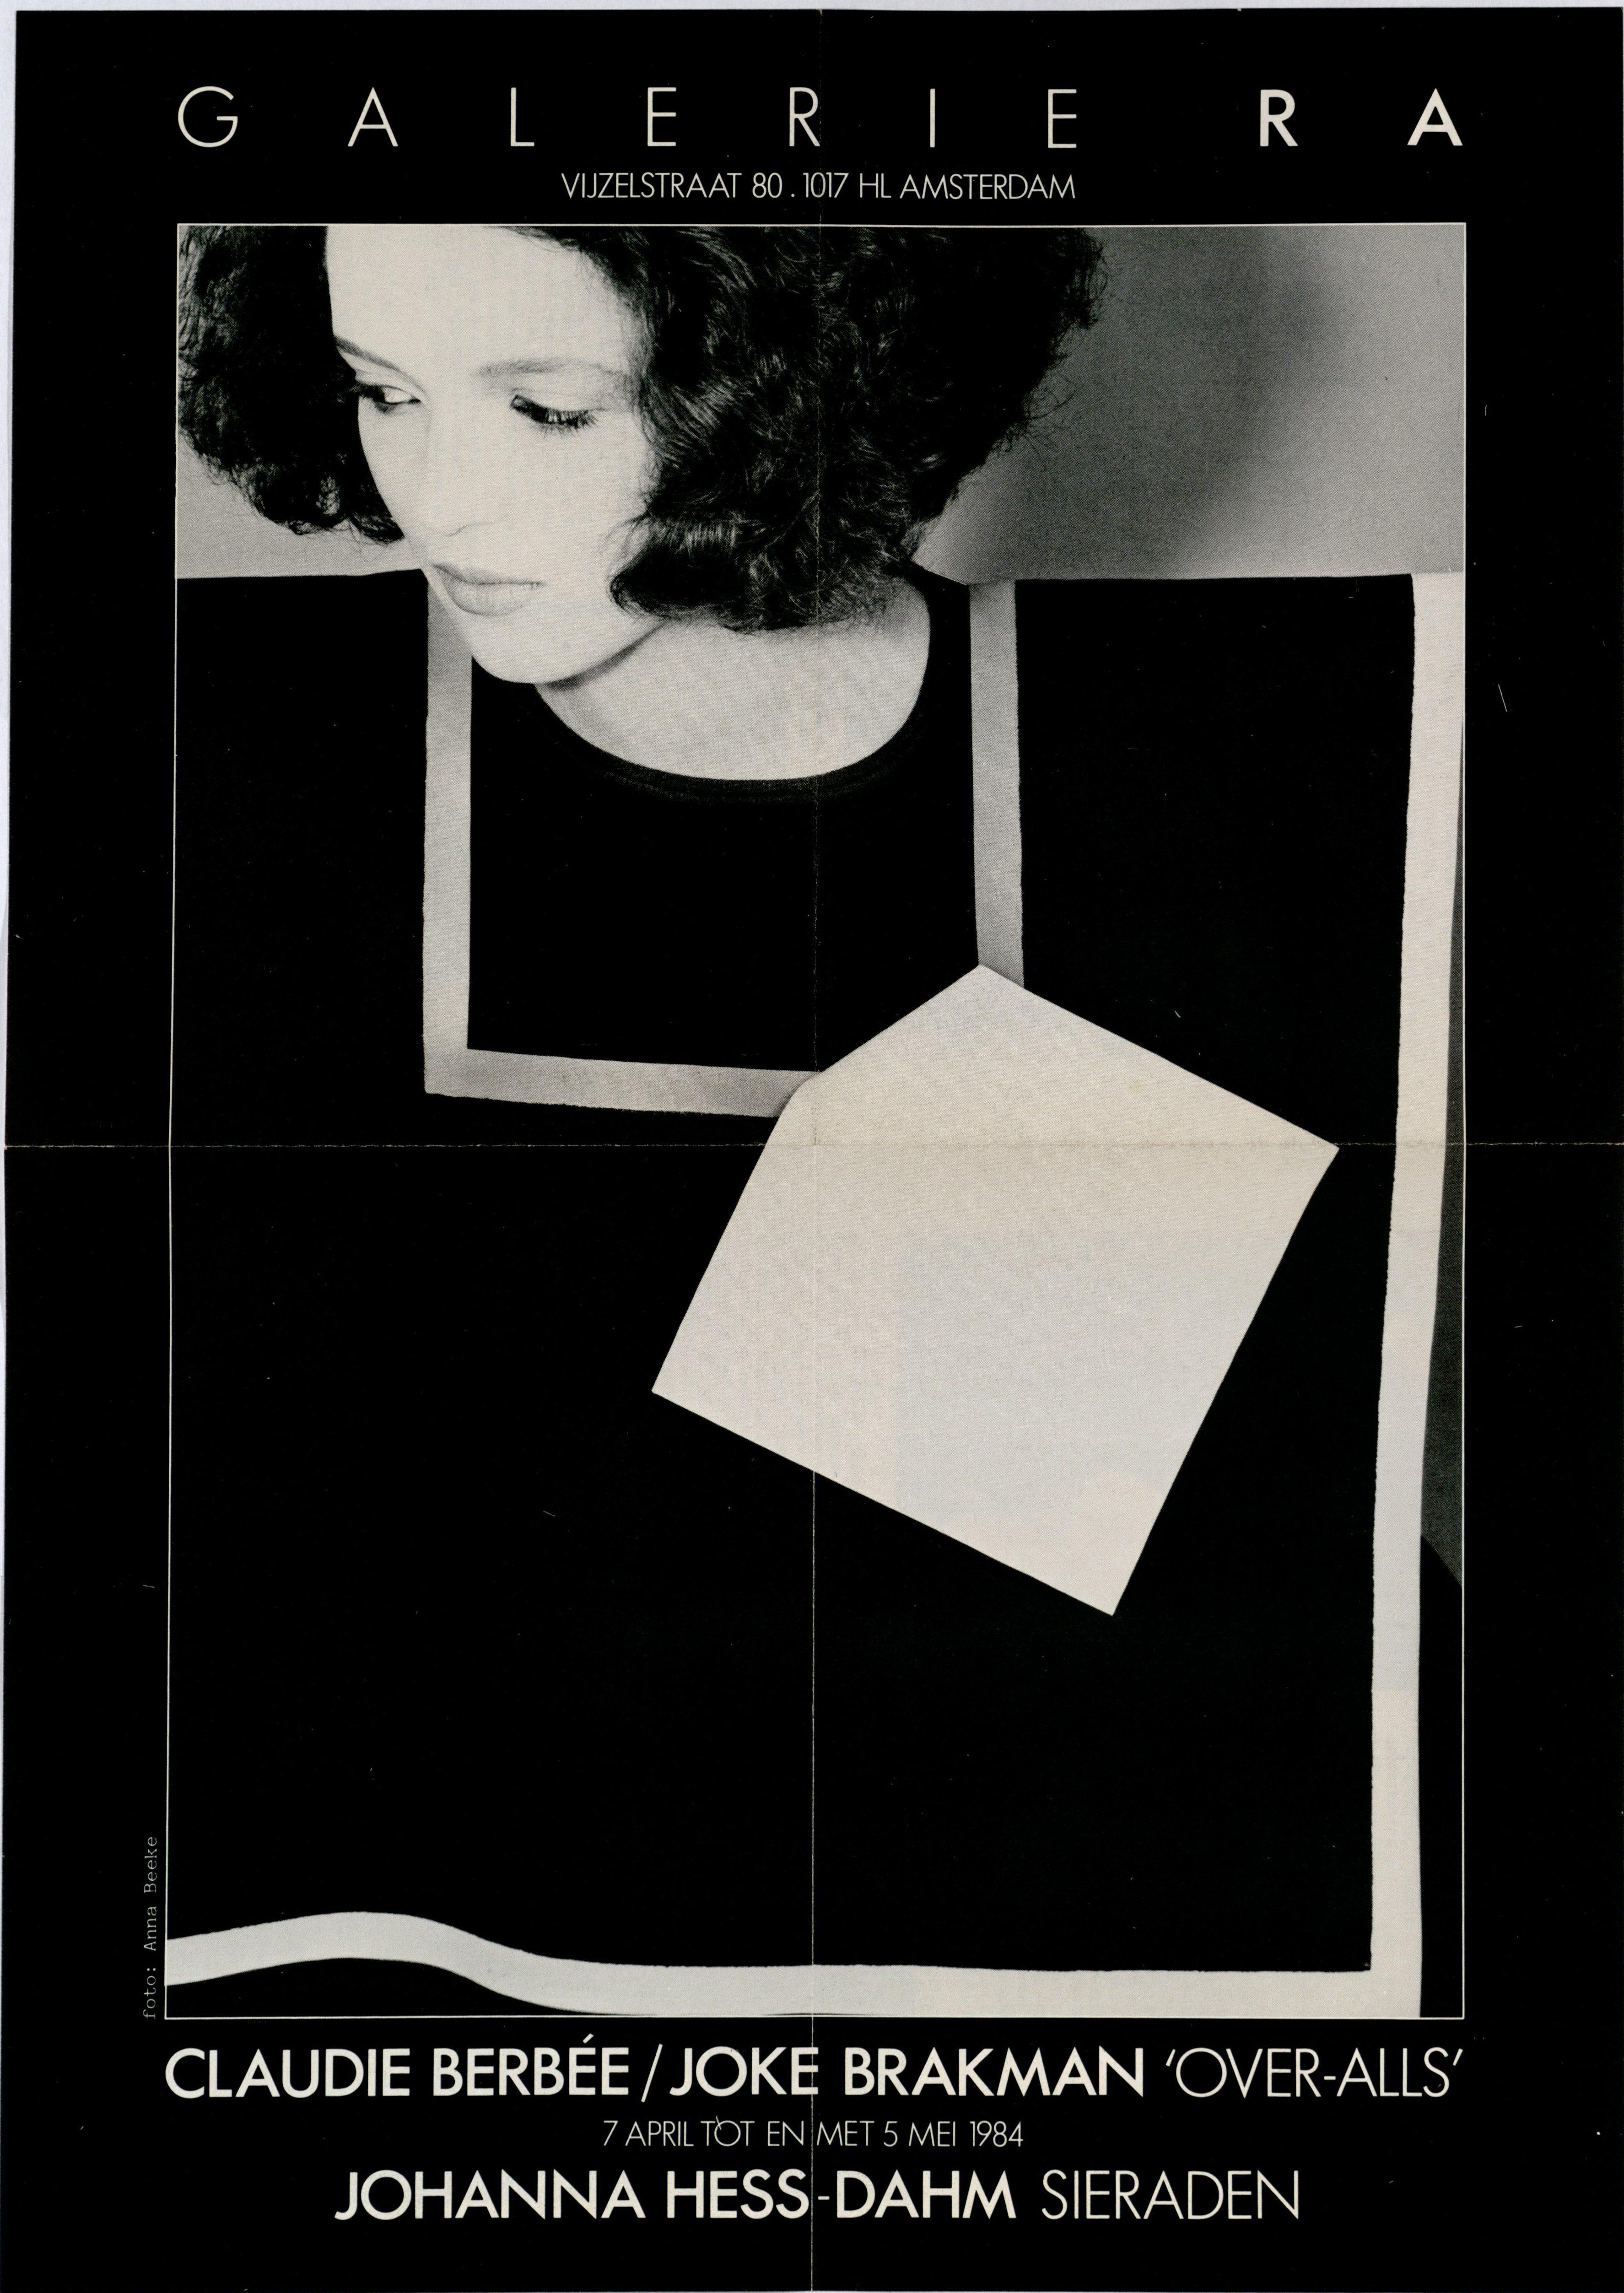 Ra Bulletin 10, april 1984, voorzijde met over-all van Claudie Berbée en Joke Brakman, foto Anna Beeke, drukwerk, papier, textiel